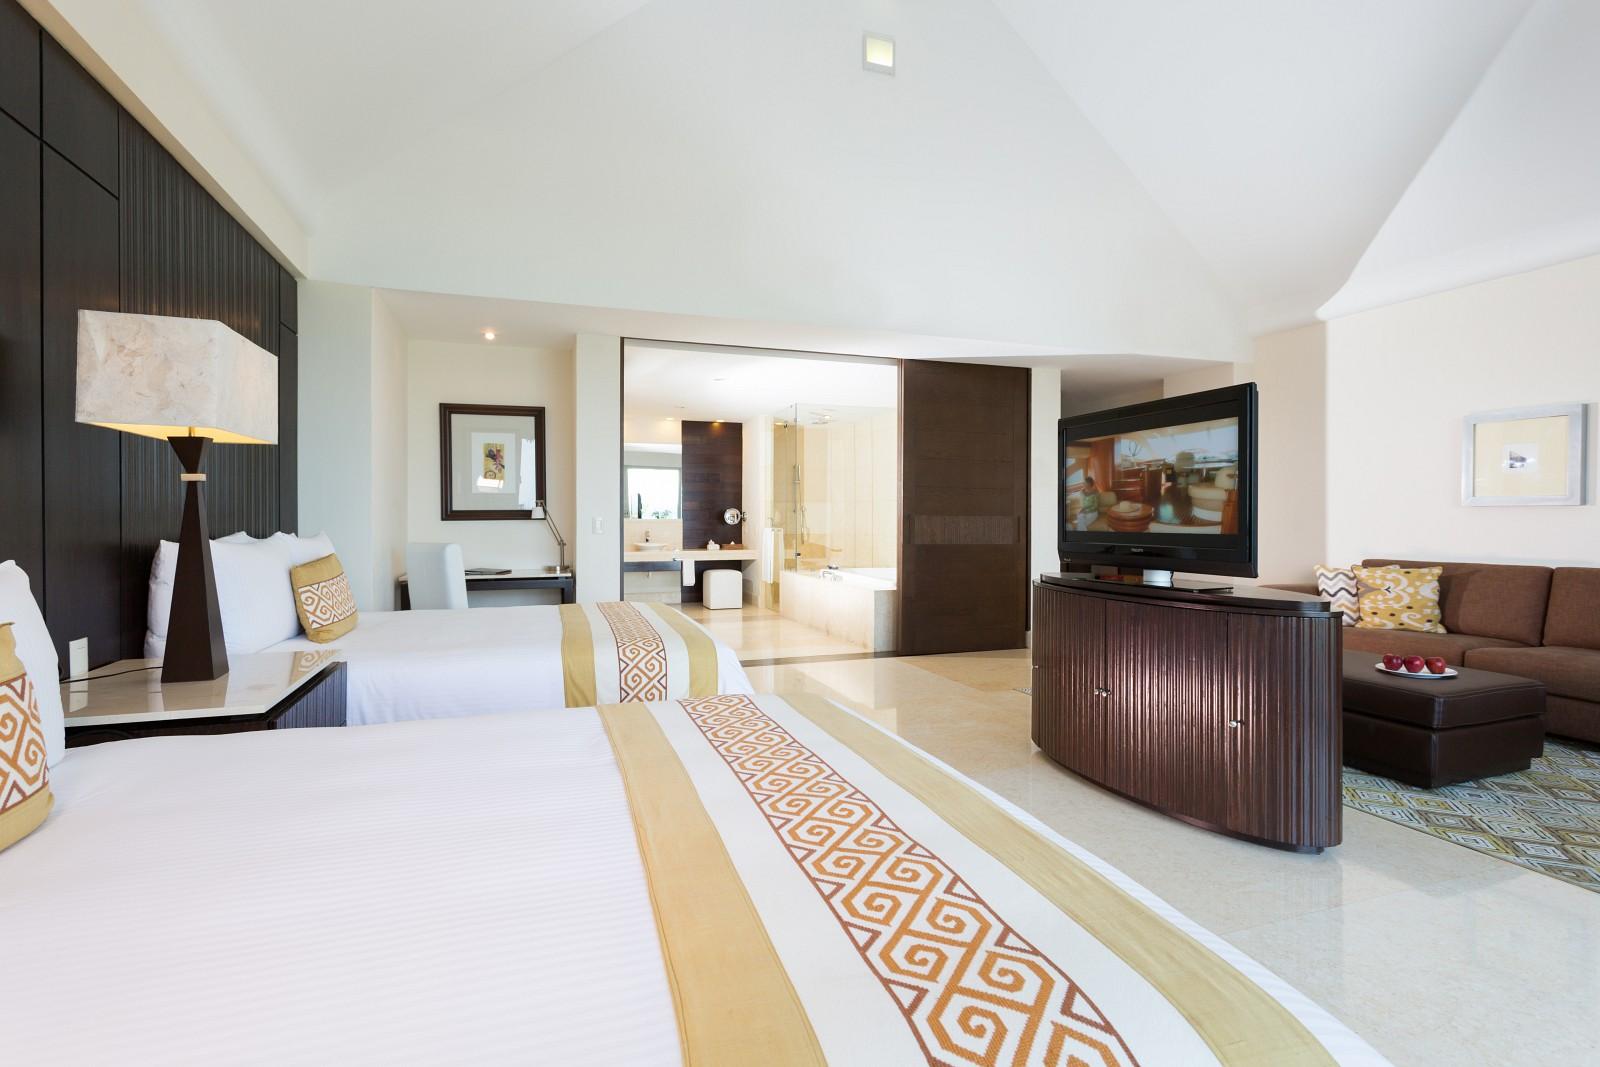 Travel Agency All-Inclusive Resort Grand Velas Riviera Maya 042